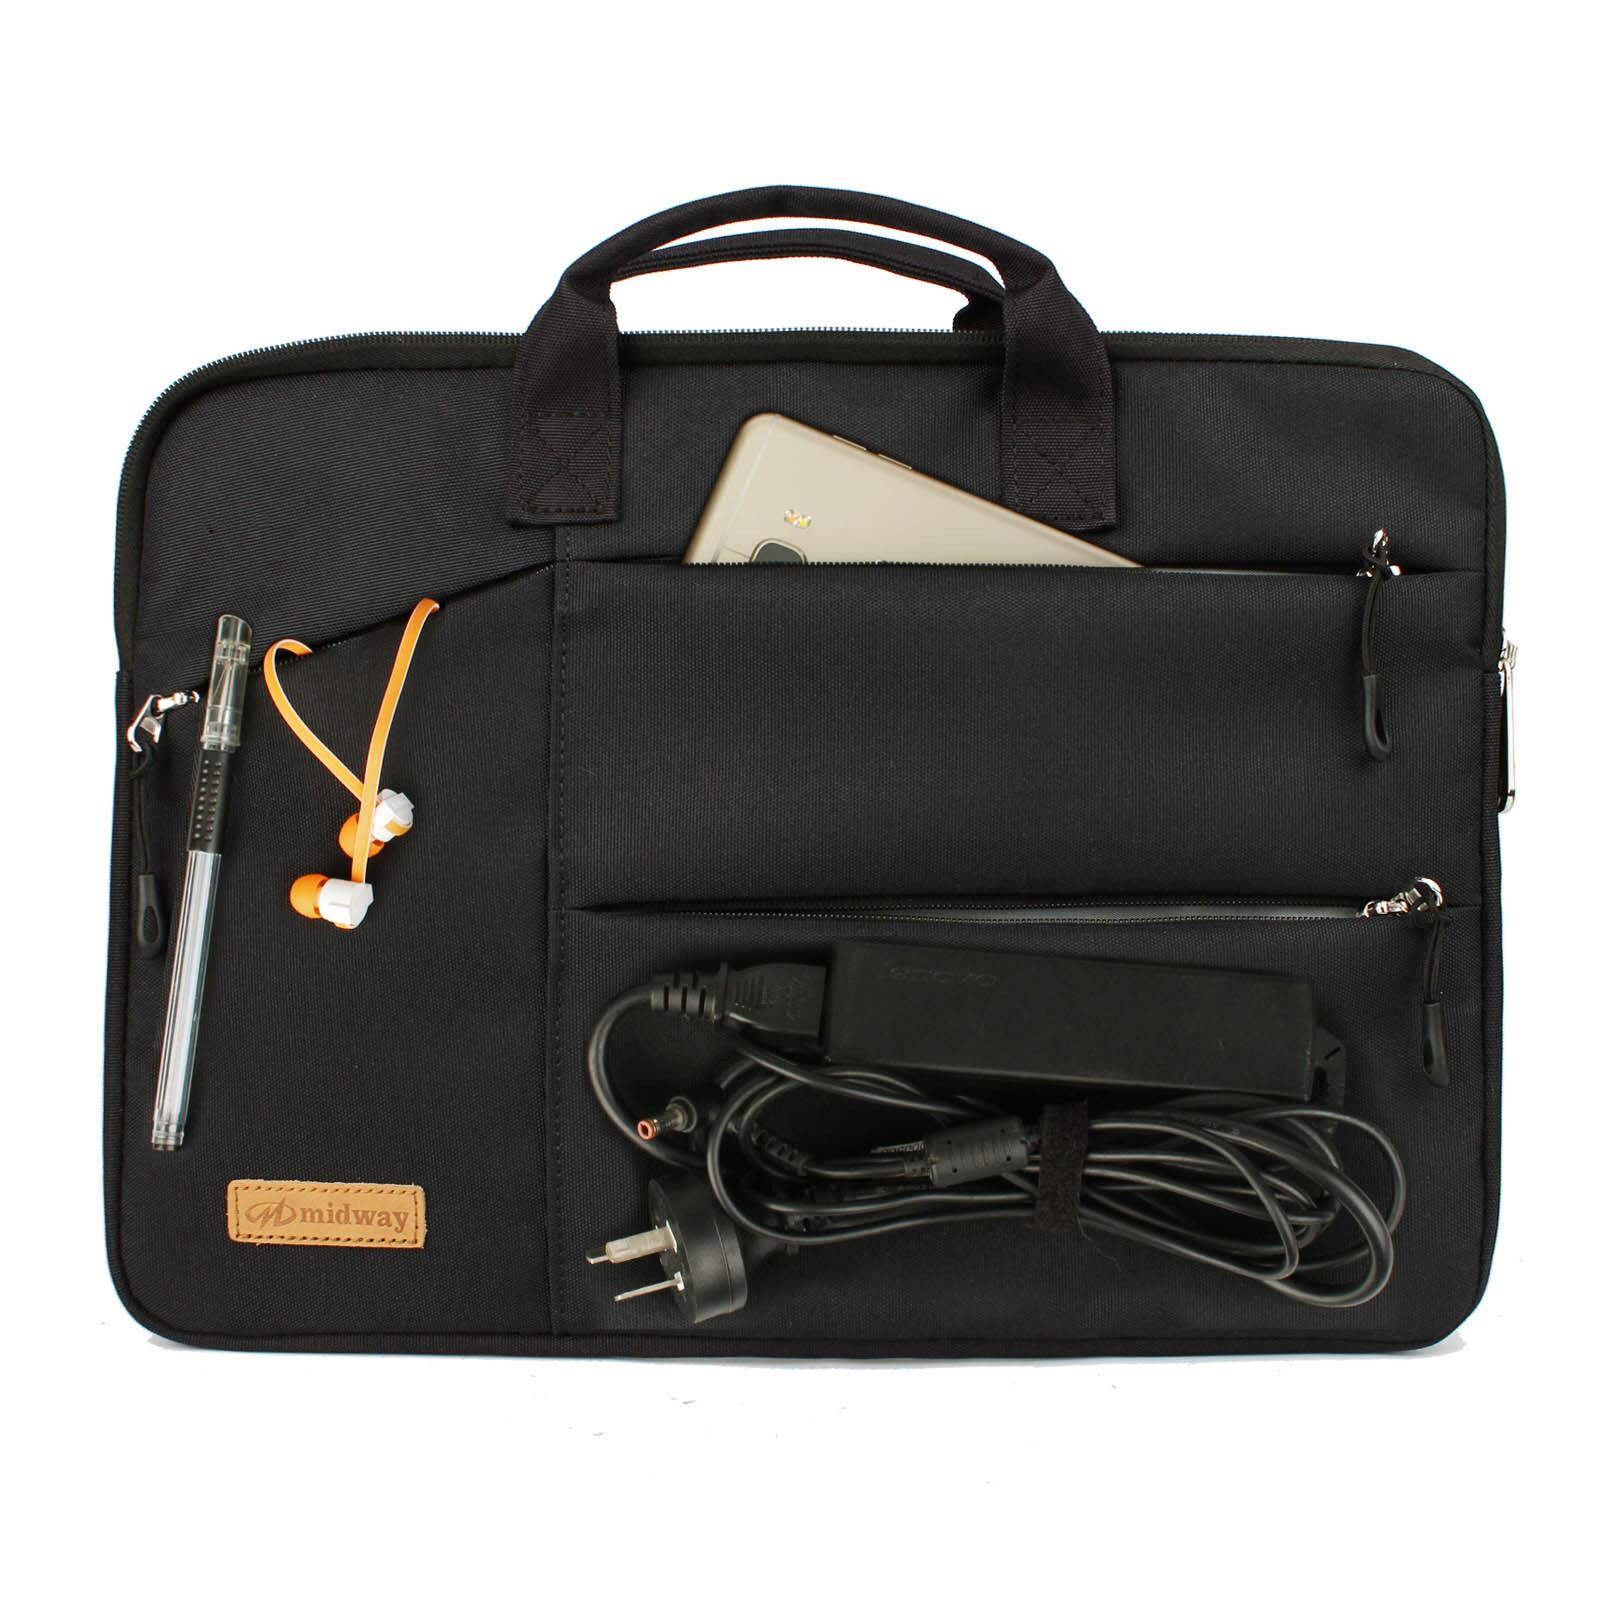 BLACK LAPTOP BAG With Zip & 2 Handles Sleeve Skin Case For 1